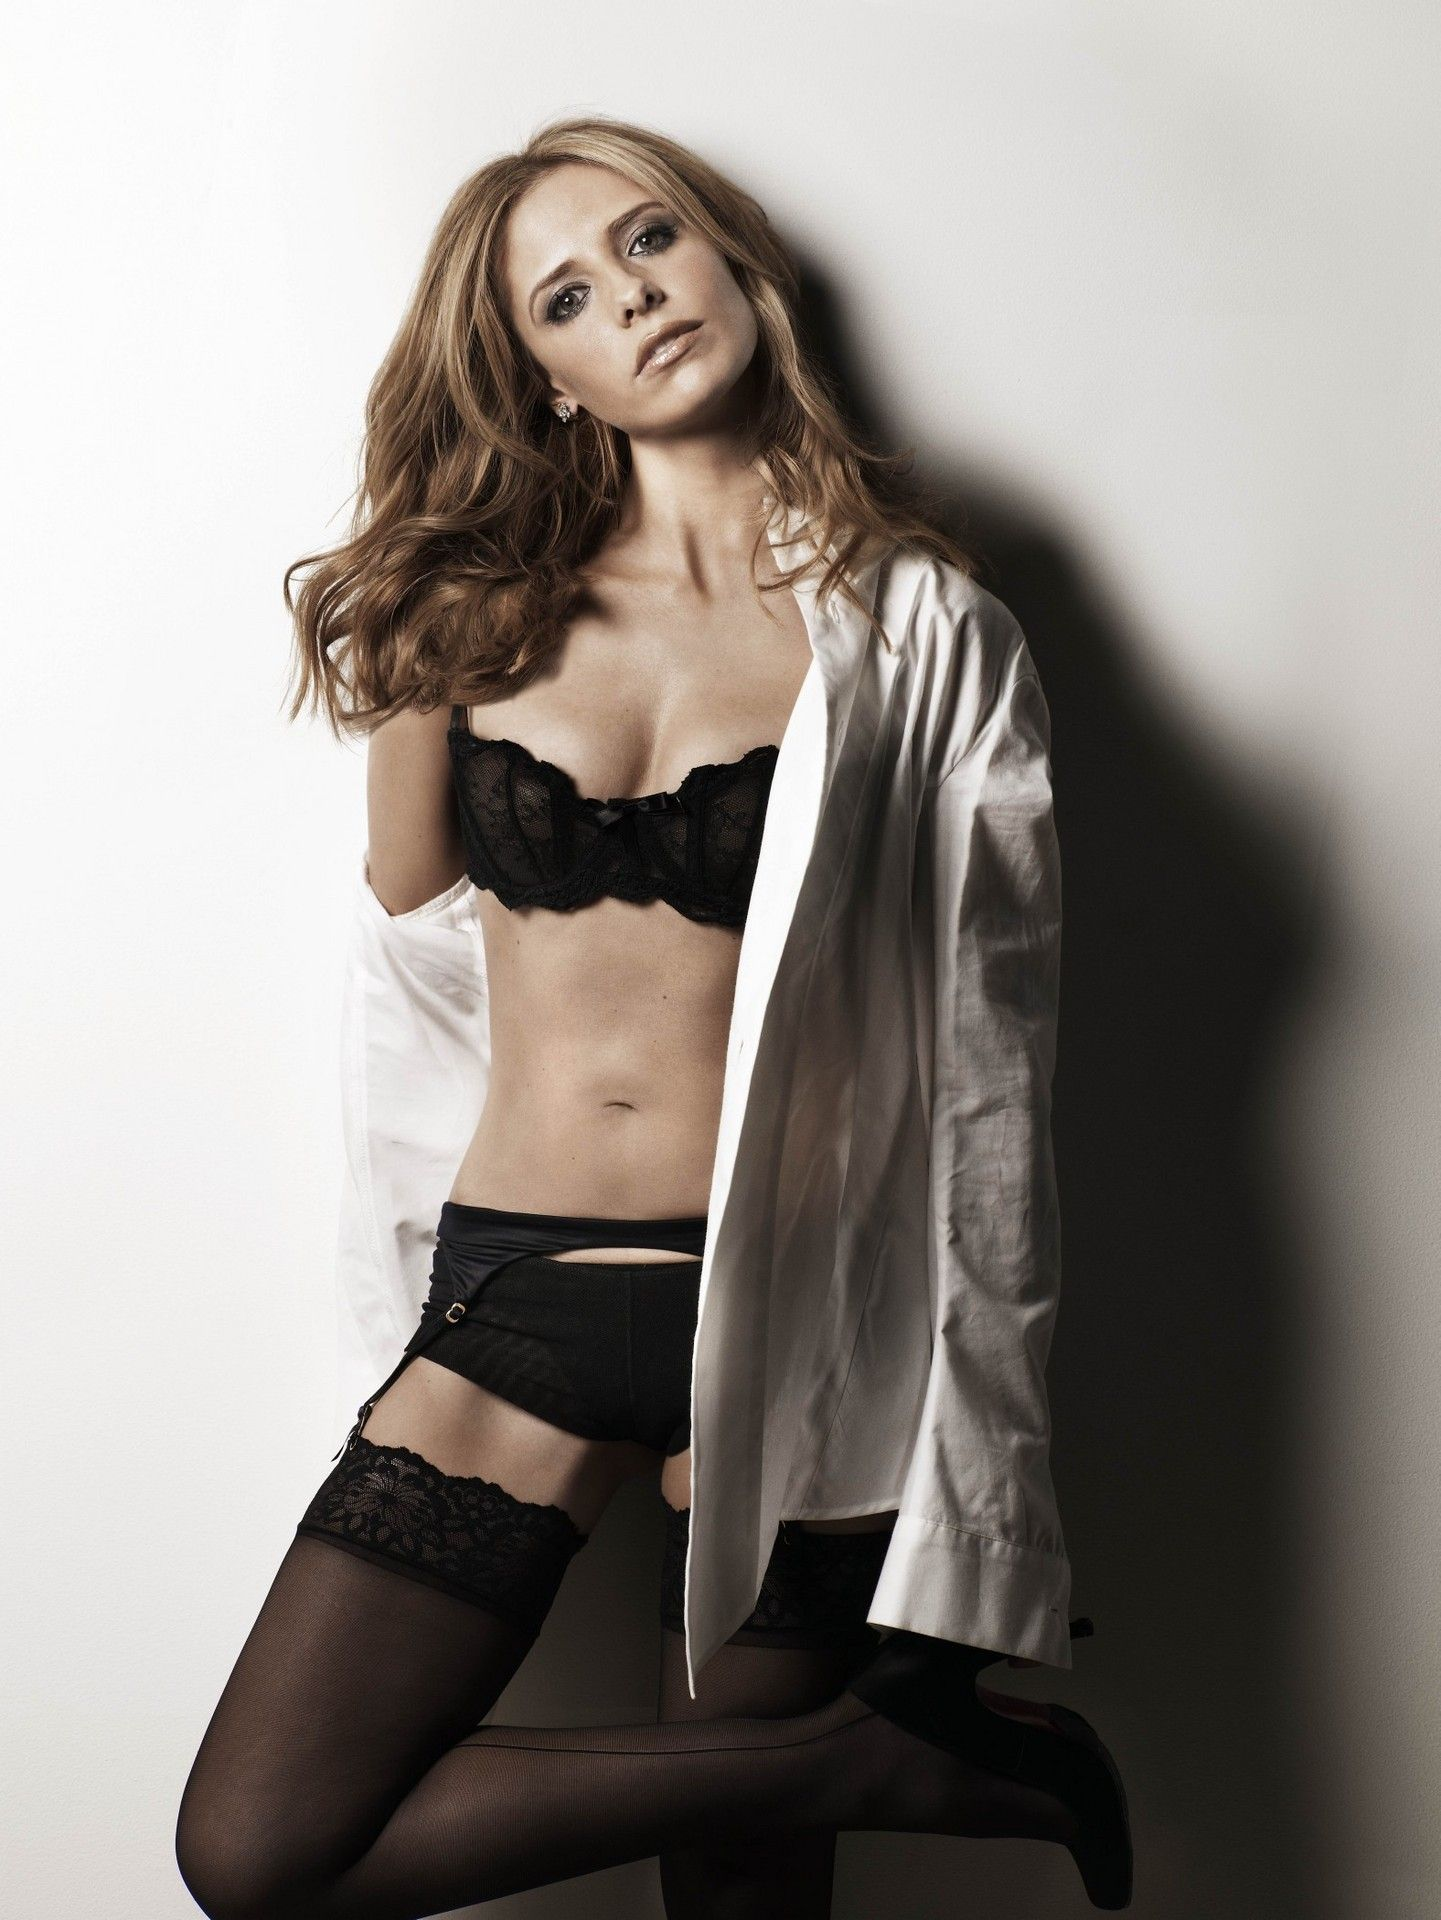 Sandra Ochse heiß und sexy